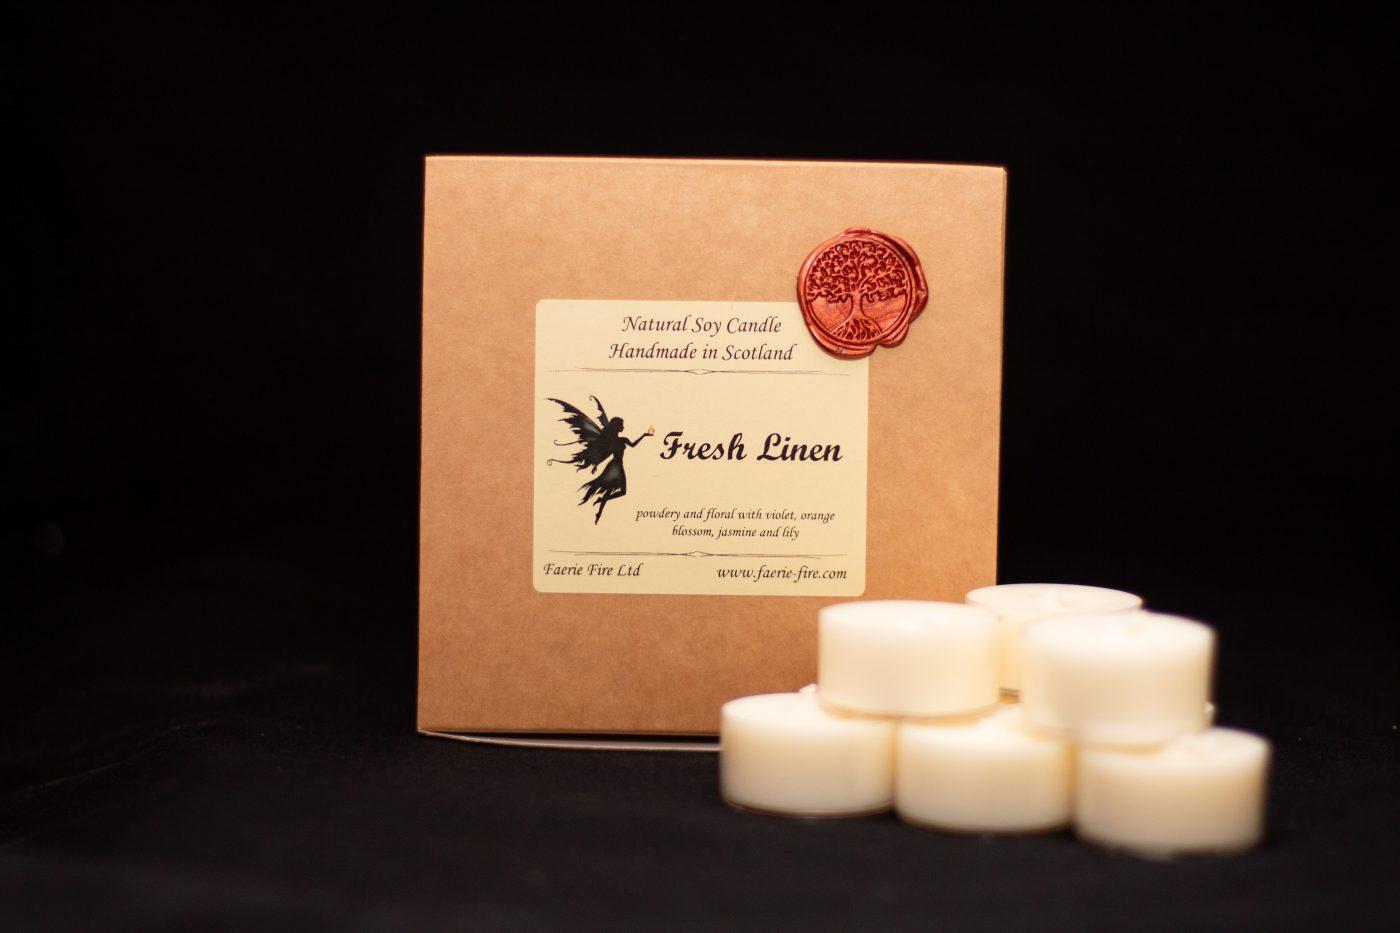 Fresh Linen Natural Soy Vegan Tealights